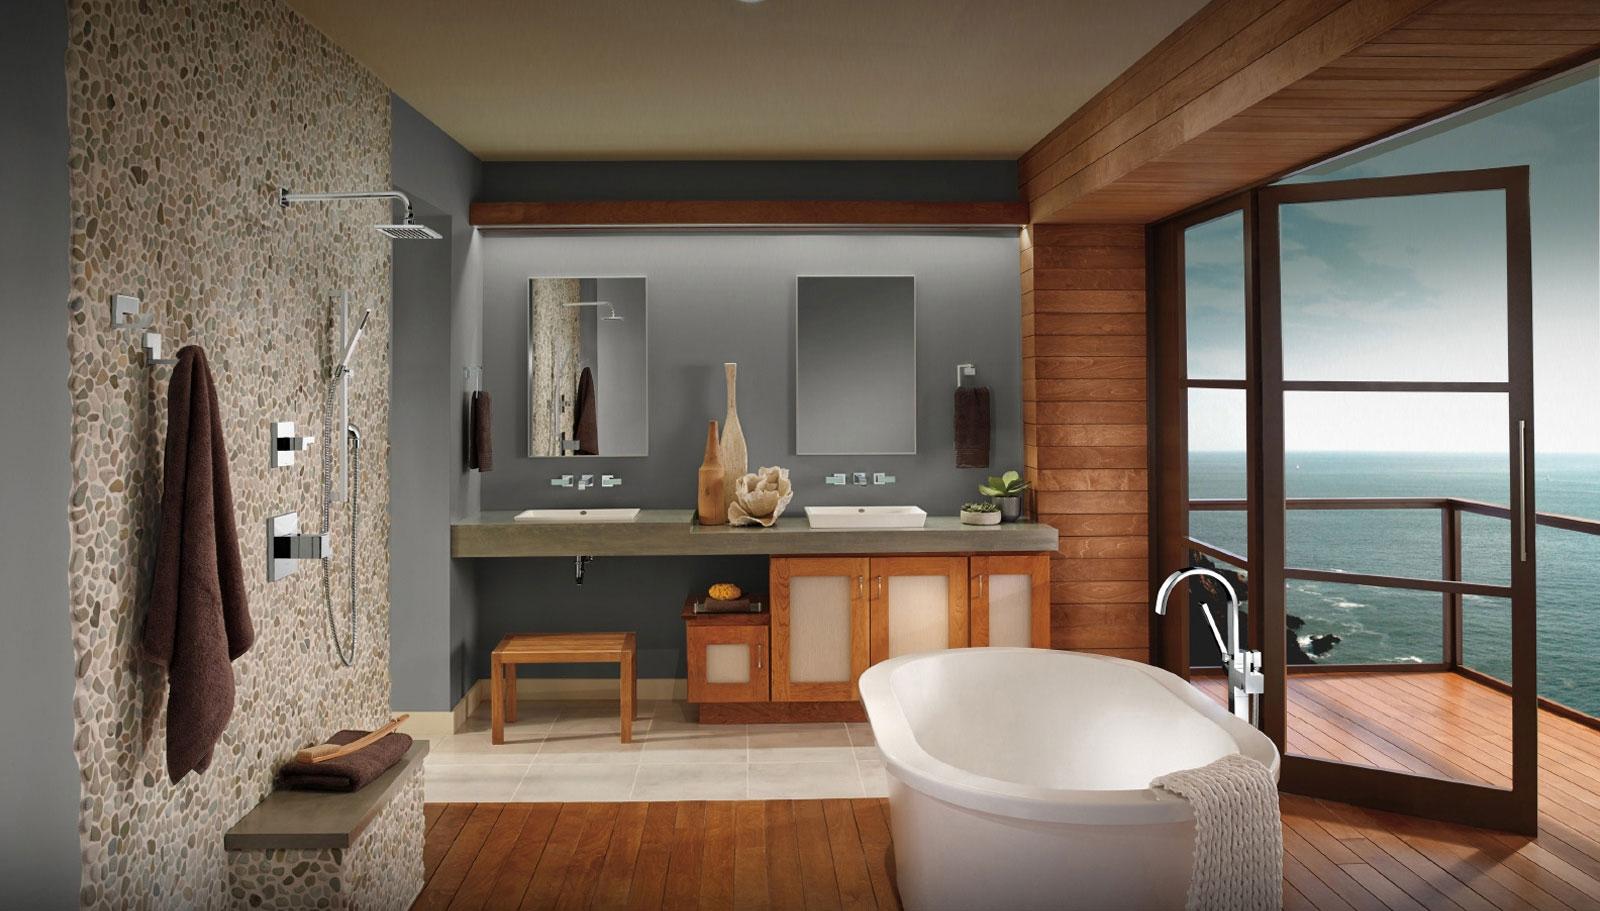 Ideas, brizo virage wall mount faucet brizo virage wall mount faucet siderna bath brizo 1600 x 911  .